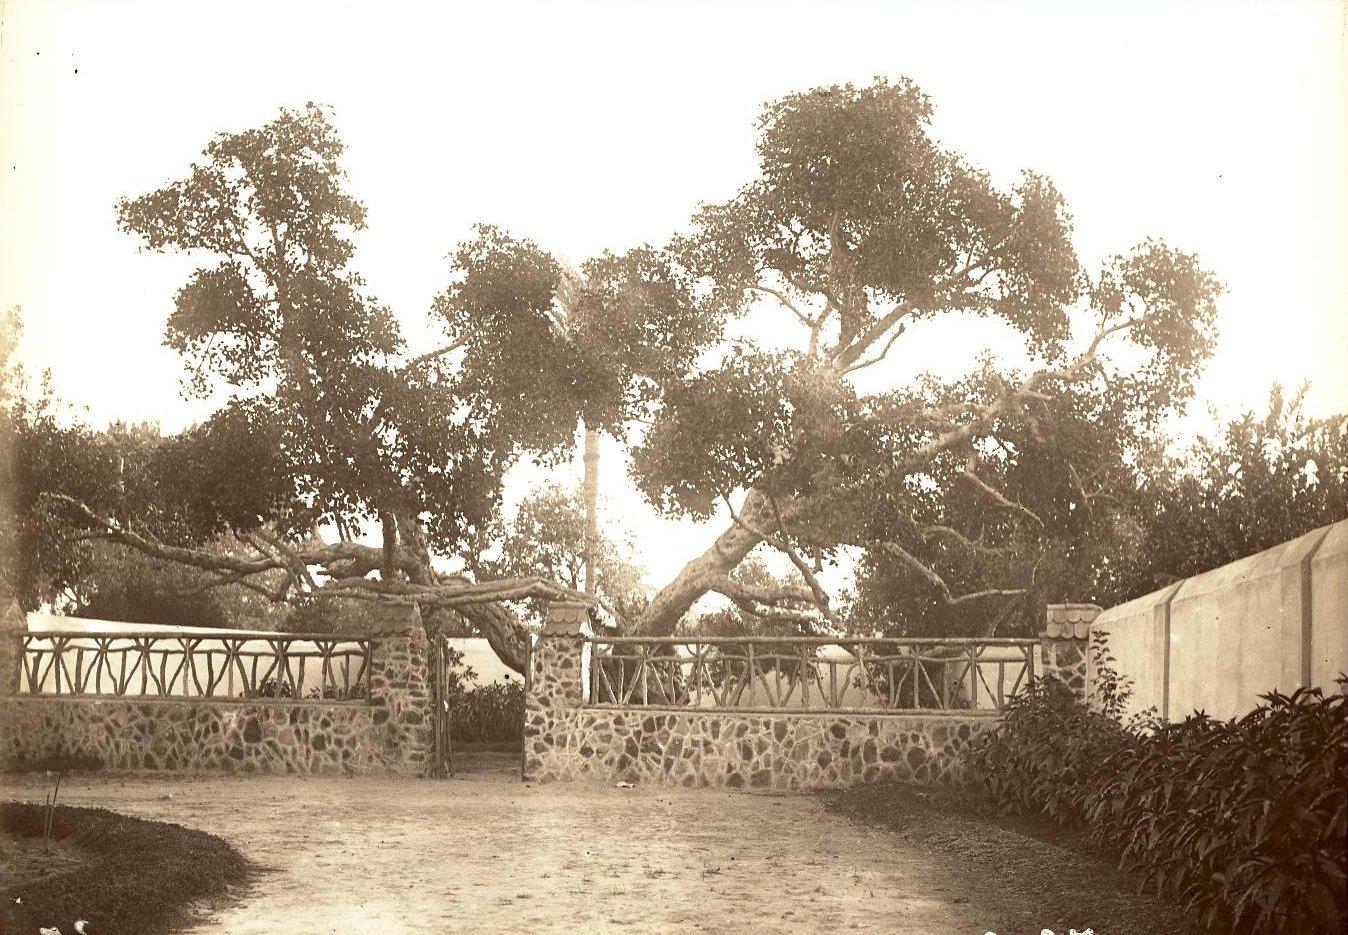 18. Египет. Каир. Дерево Богоматери